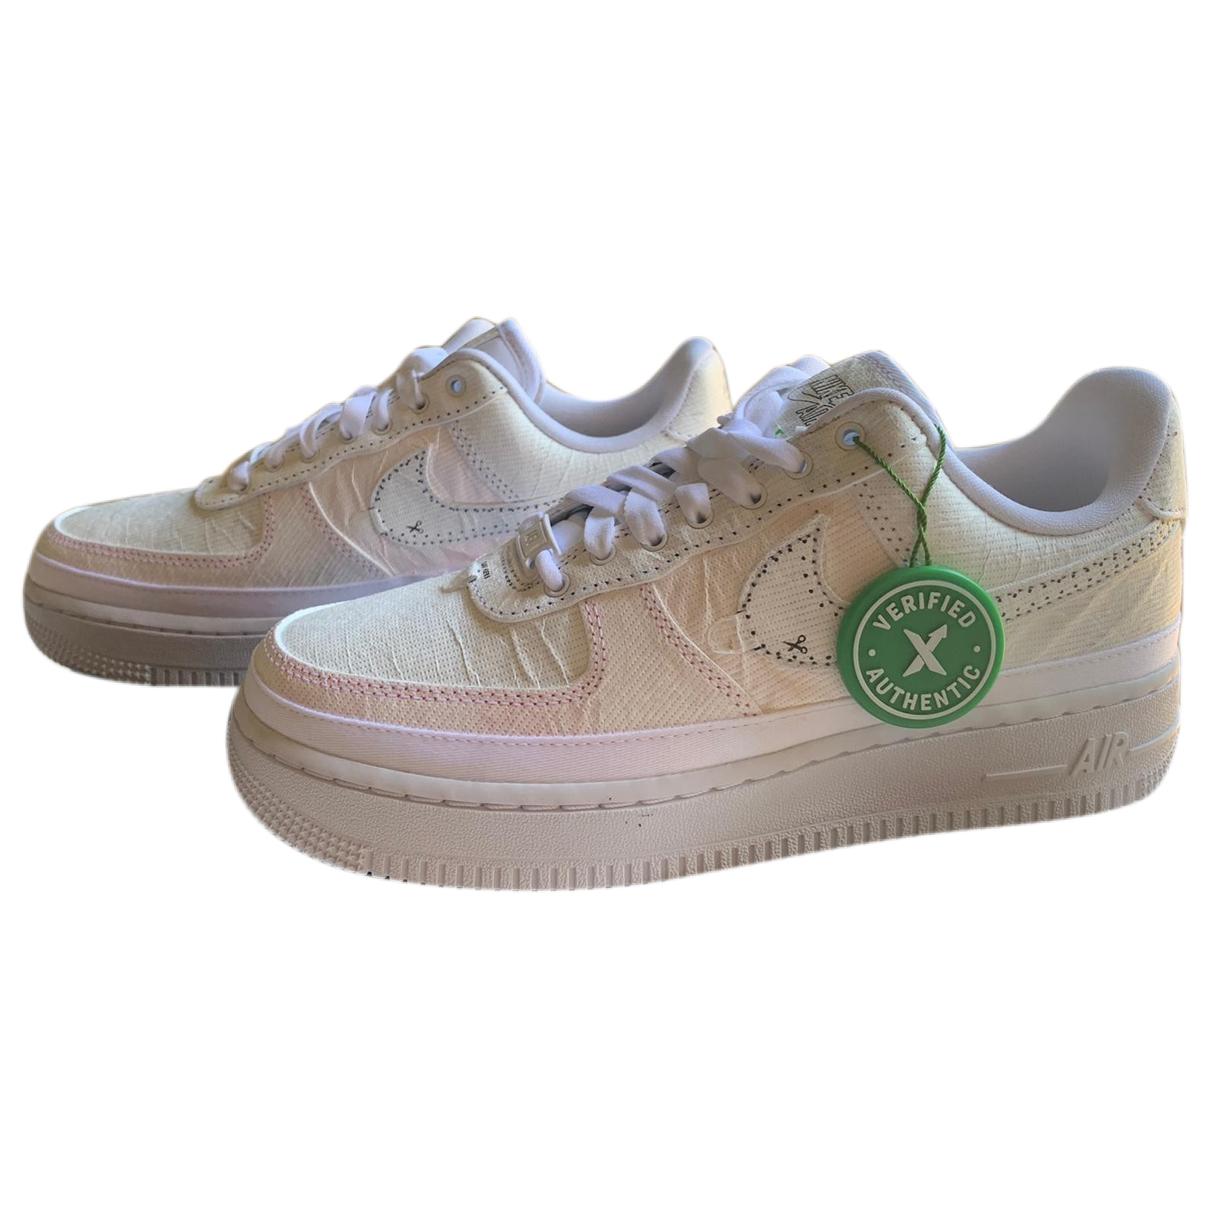 Nike Air Force 1 White Cloth Trainers for Women 38 EU